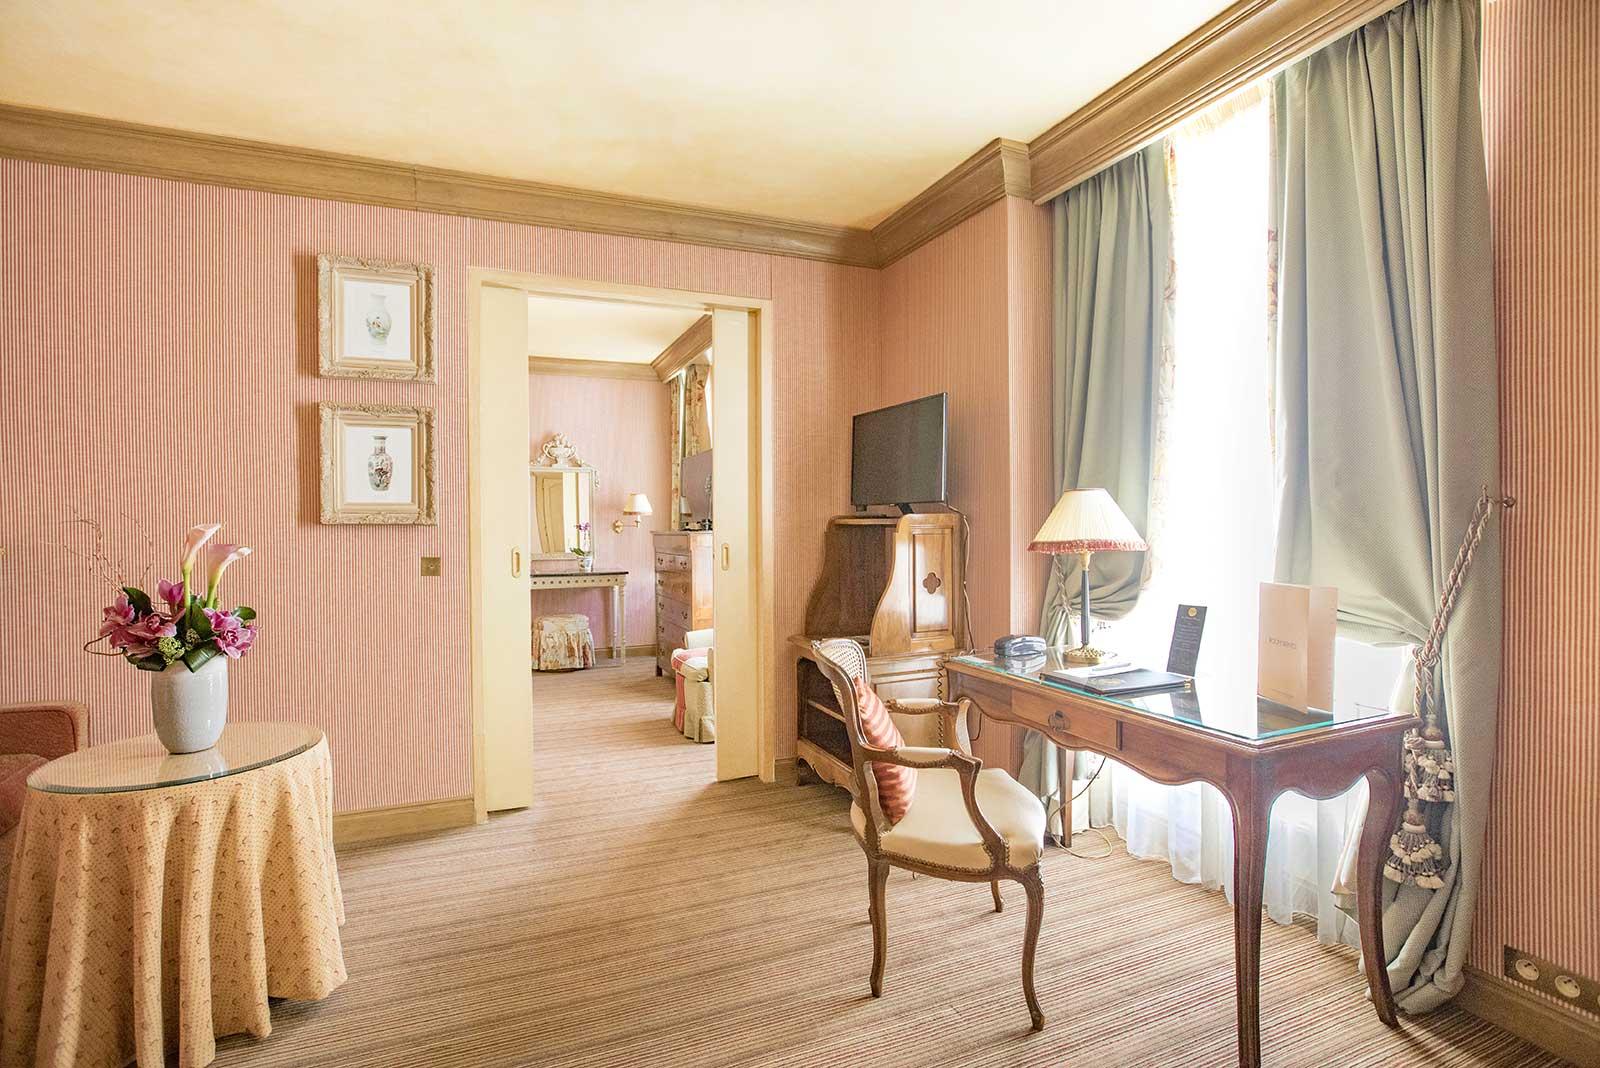 Hotel Chambiges Paris